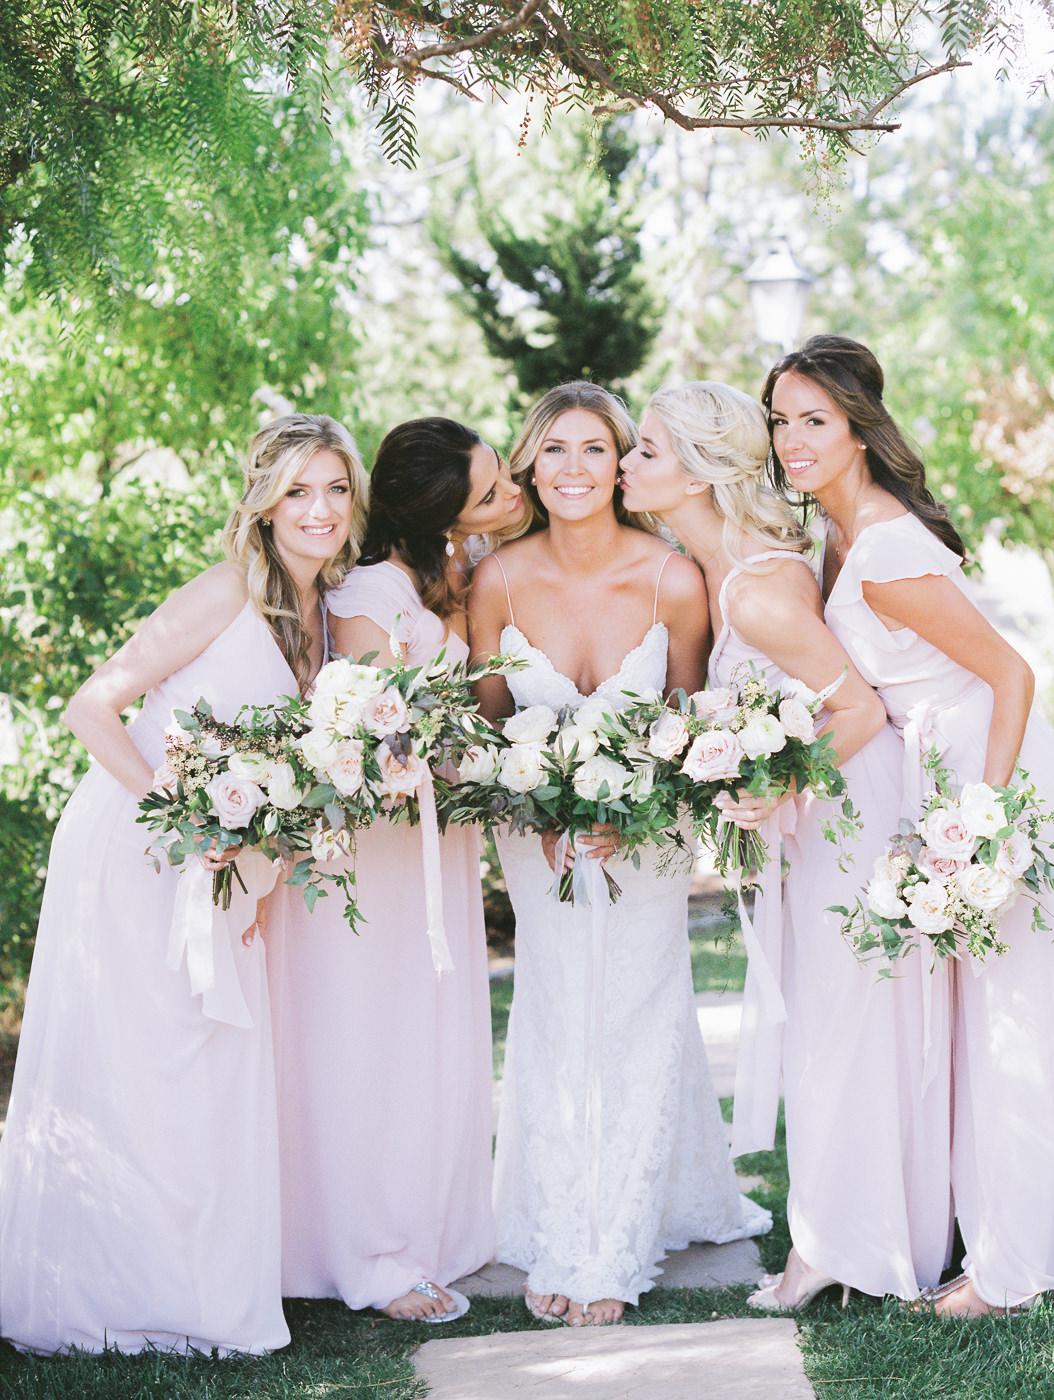 bride and bridesmaids - https://ruffledblog.com/summer-temecula-vineyard-wedding